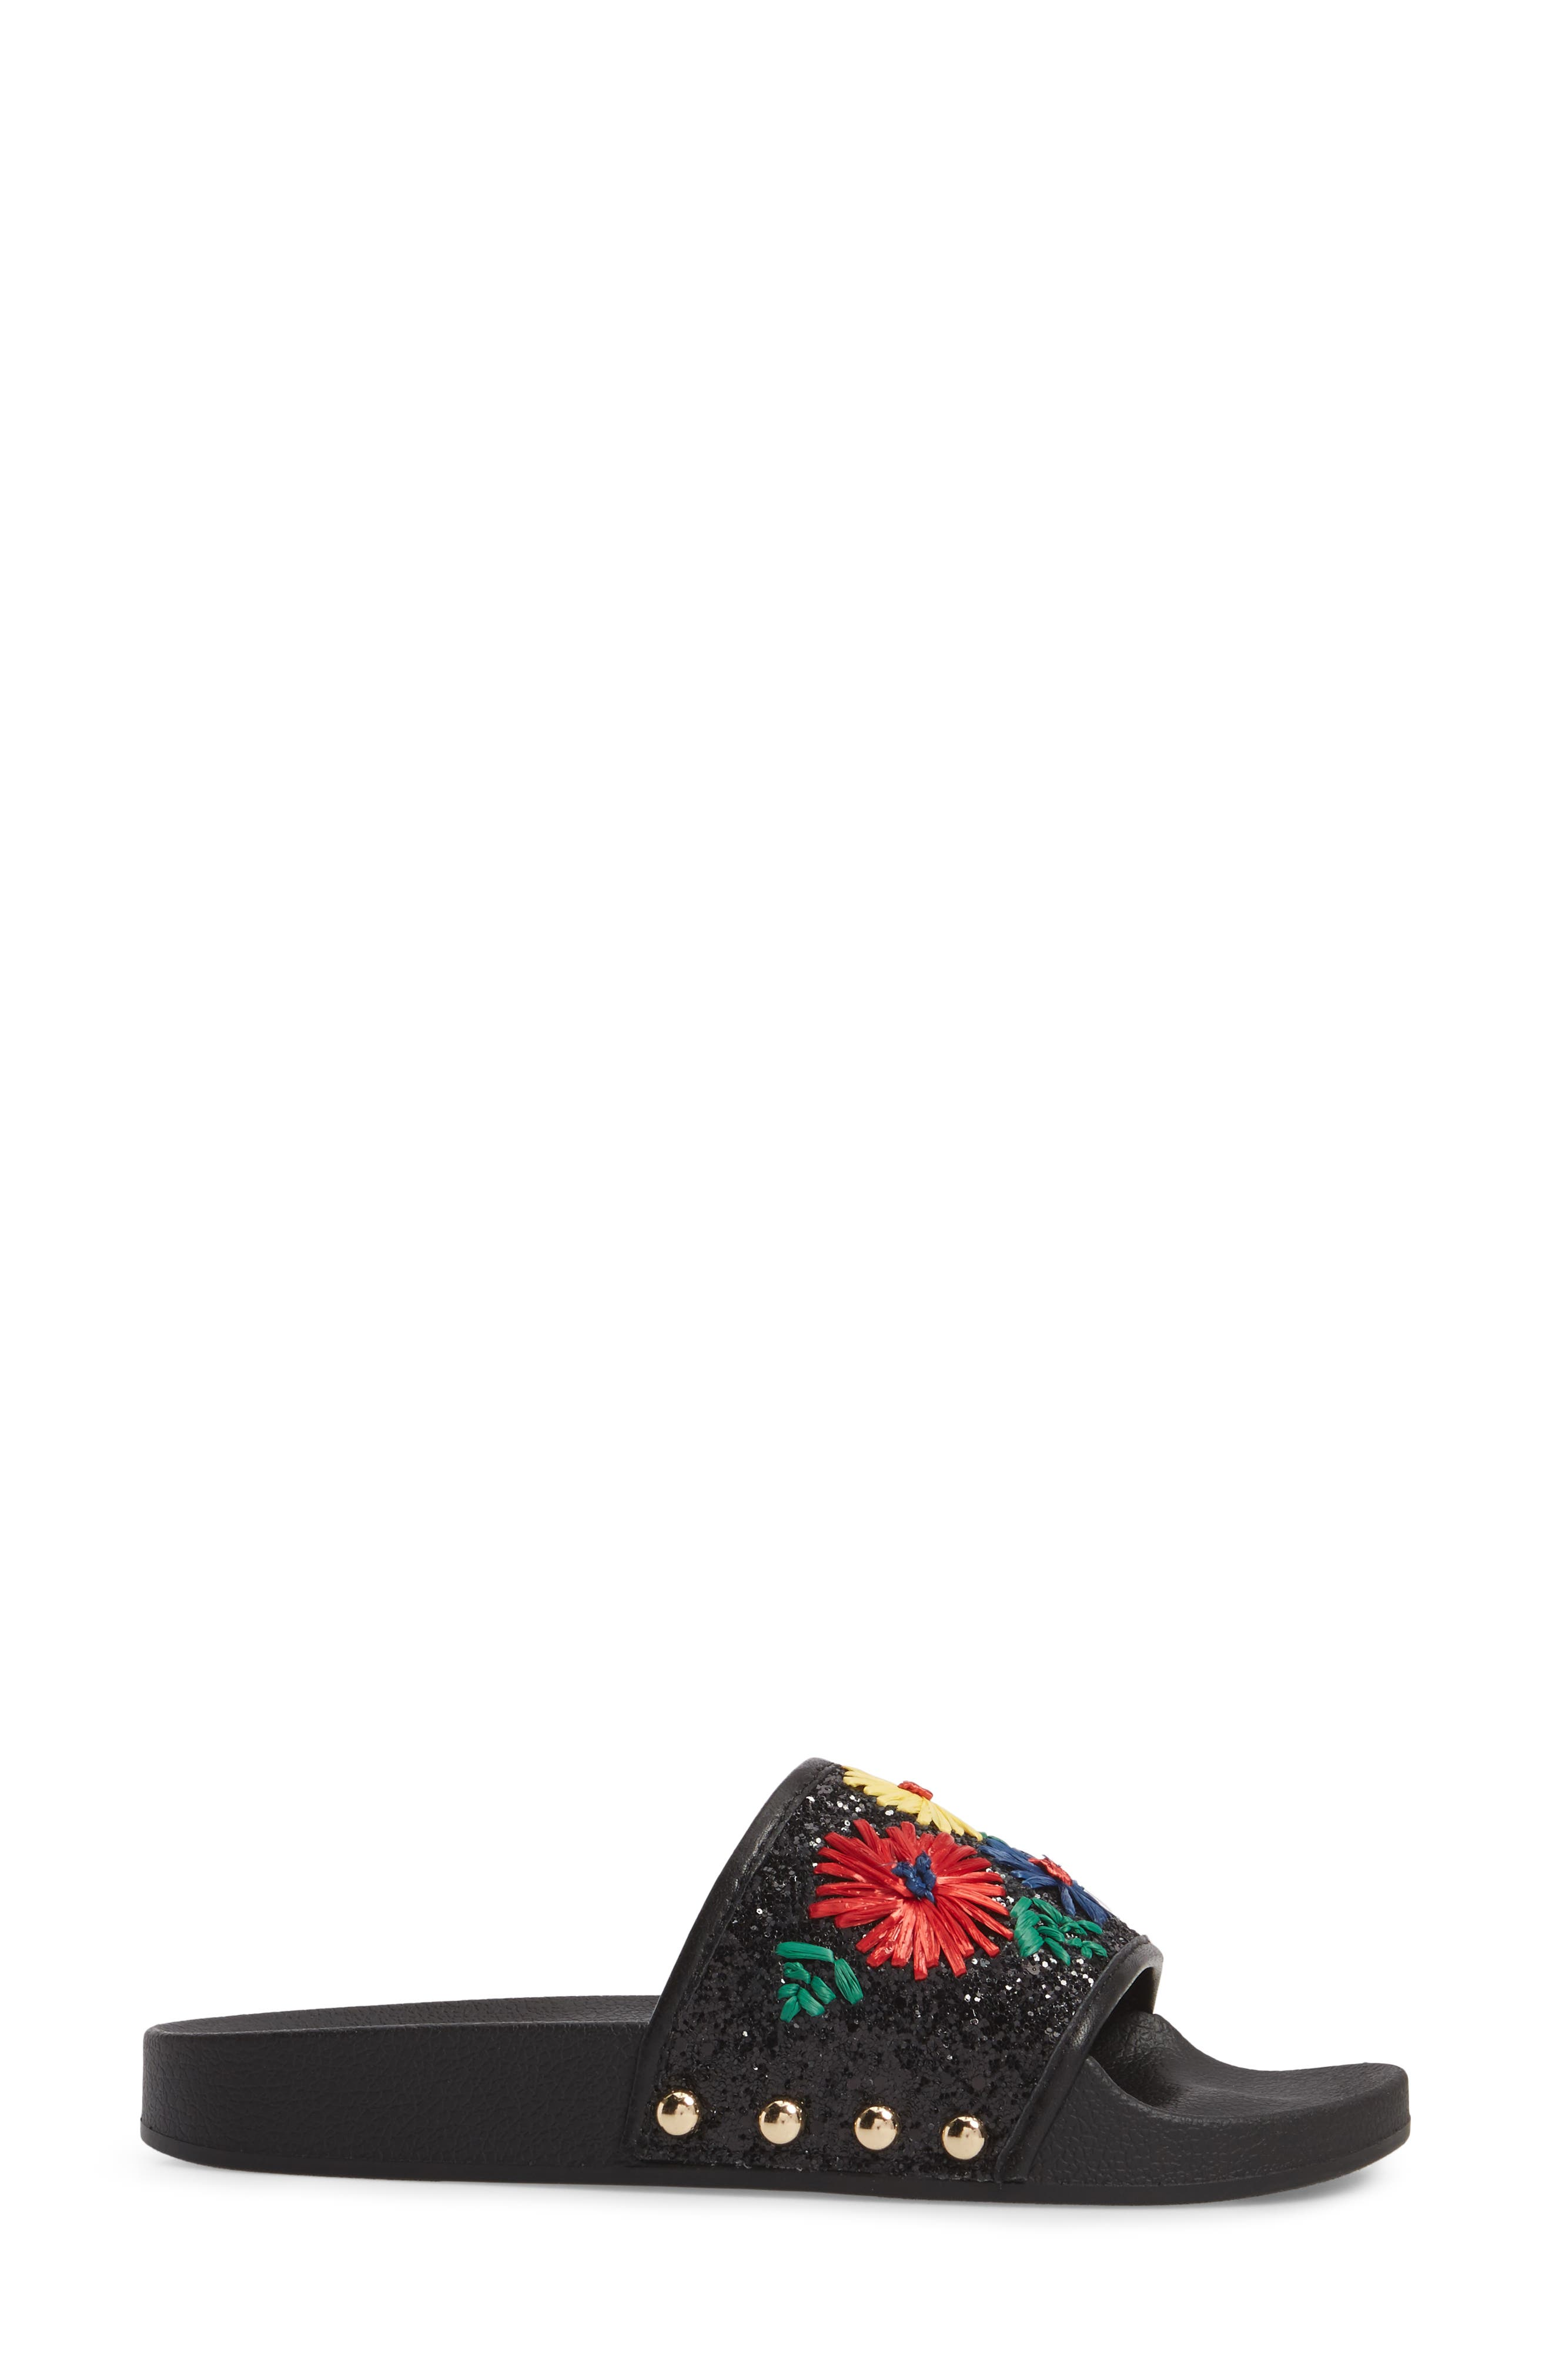 Daisy Slide Sandal,                             Alternate thumbnail 3, color,                             BRIGHT FLORAL PRINT